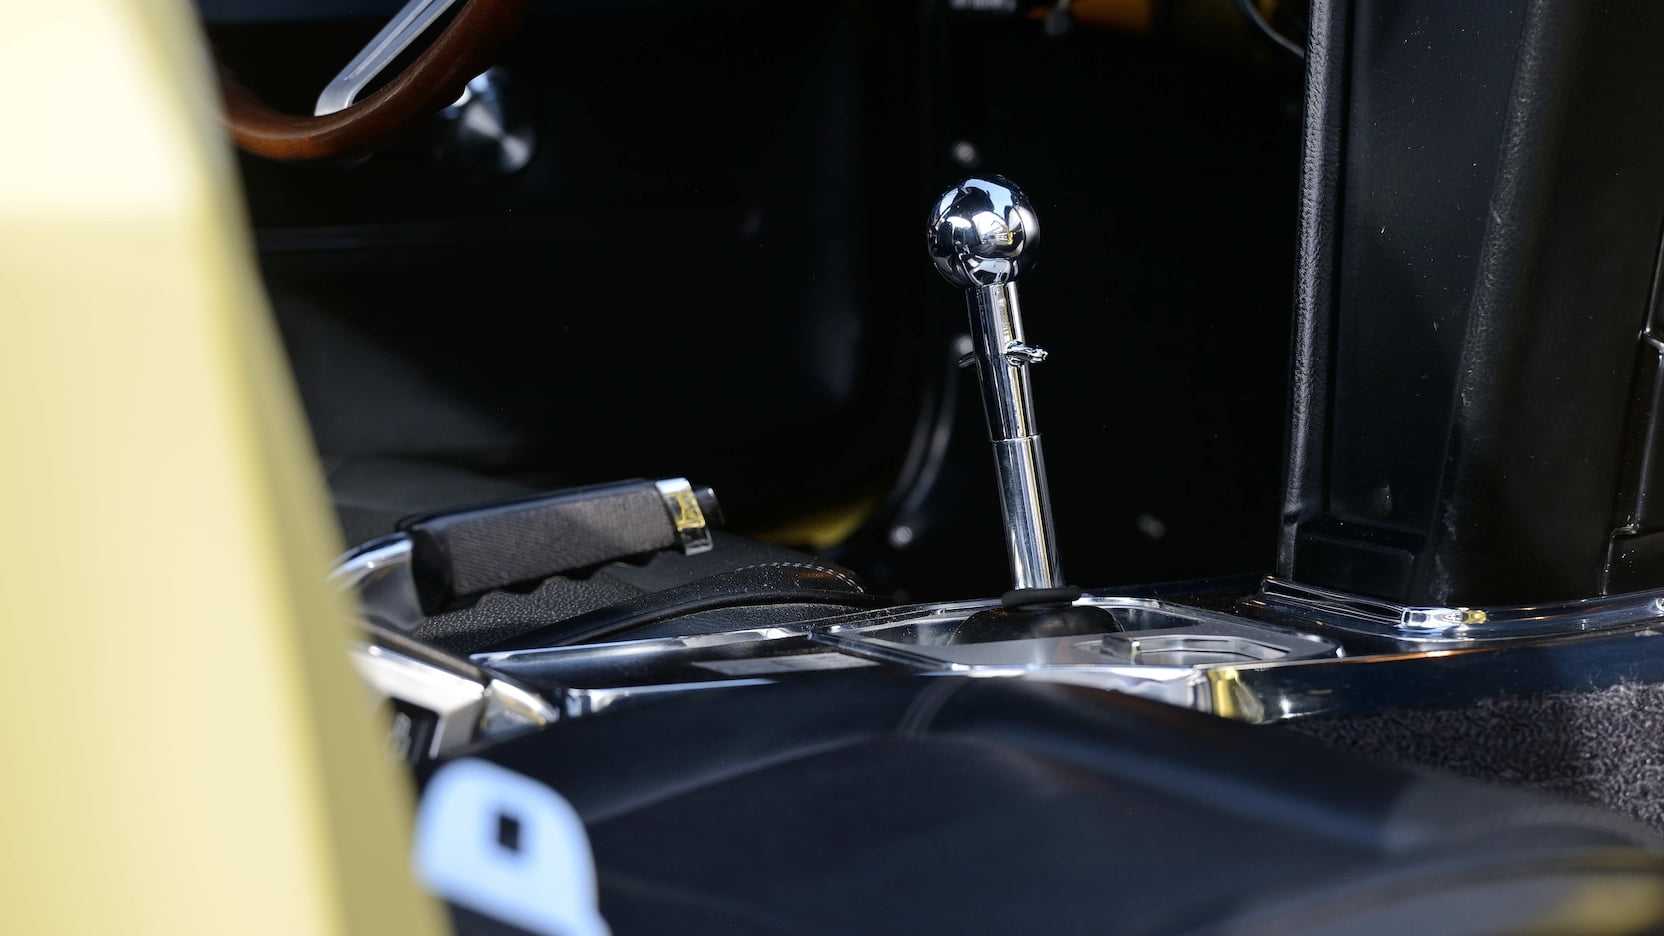 1967 Chevrolet Corvette L88 shifter